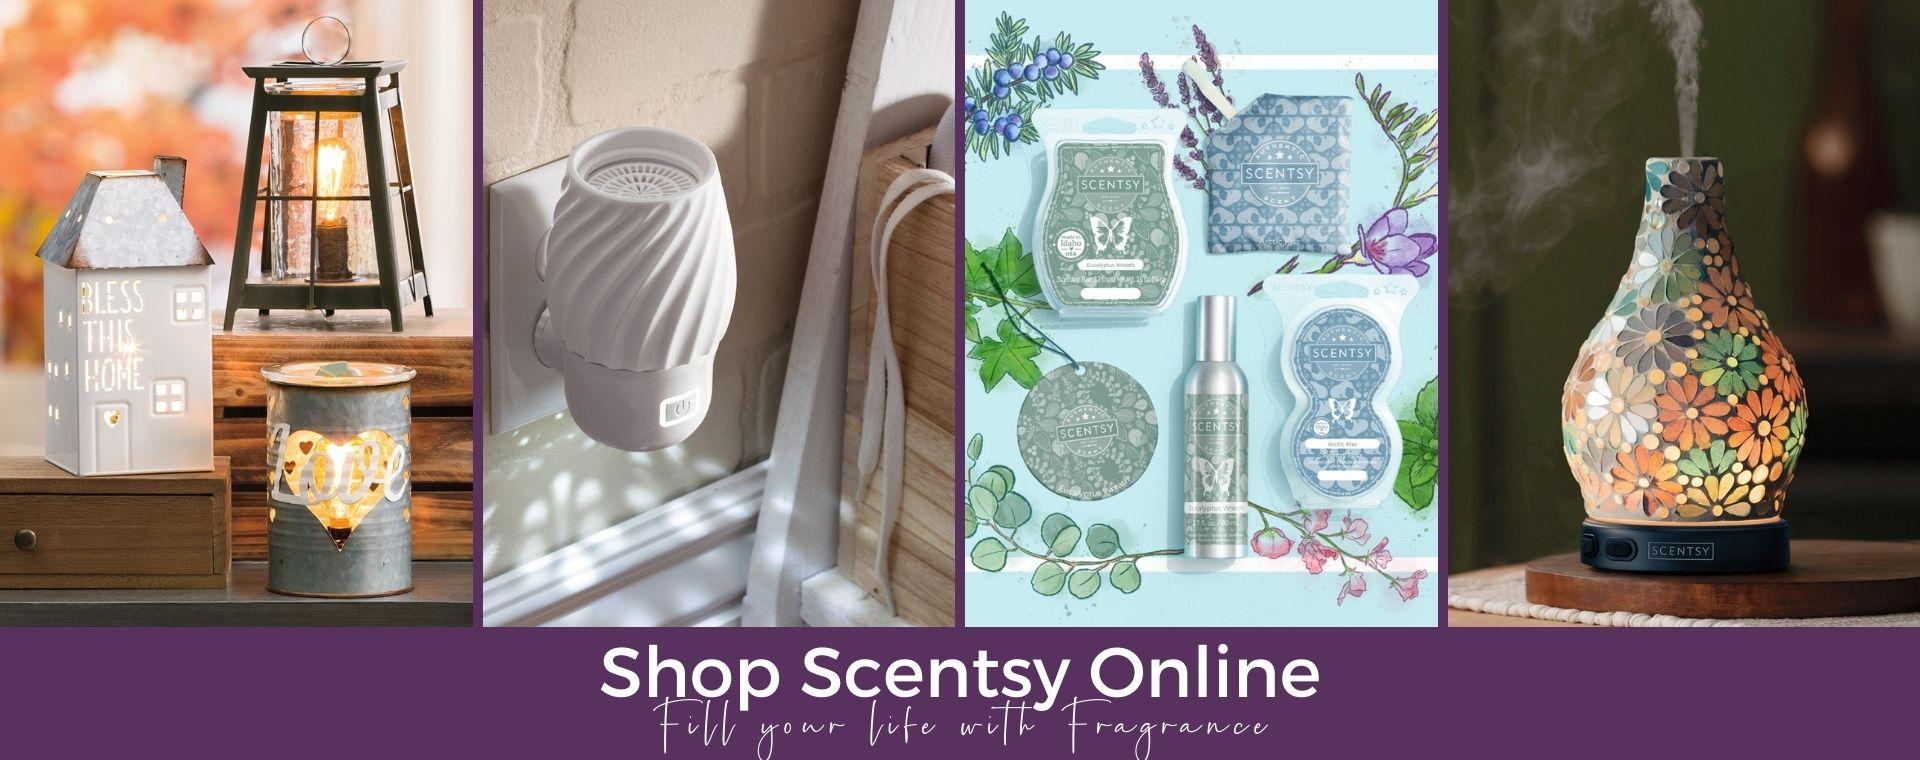 Shop Scentsy Online